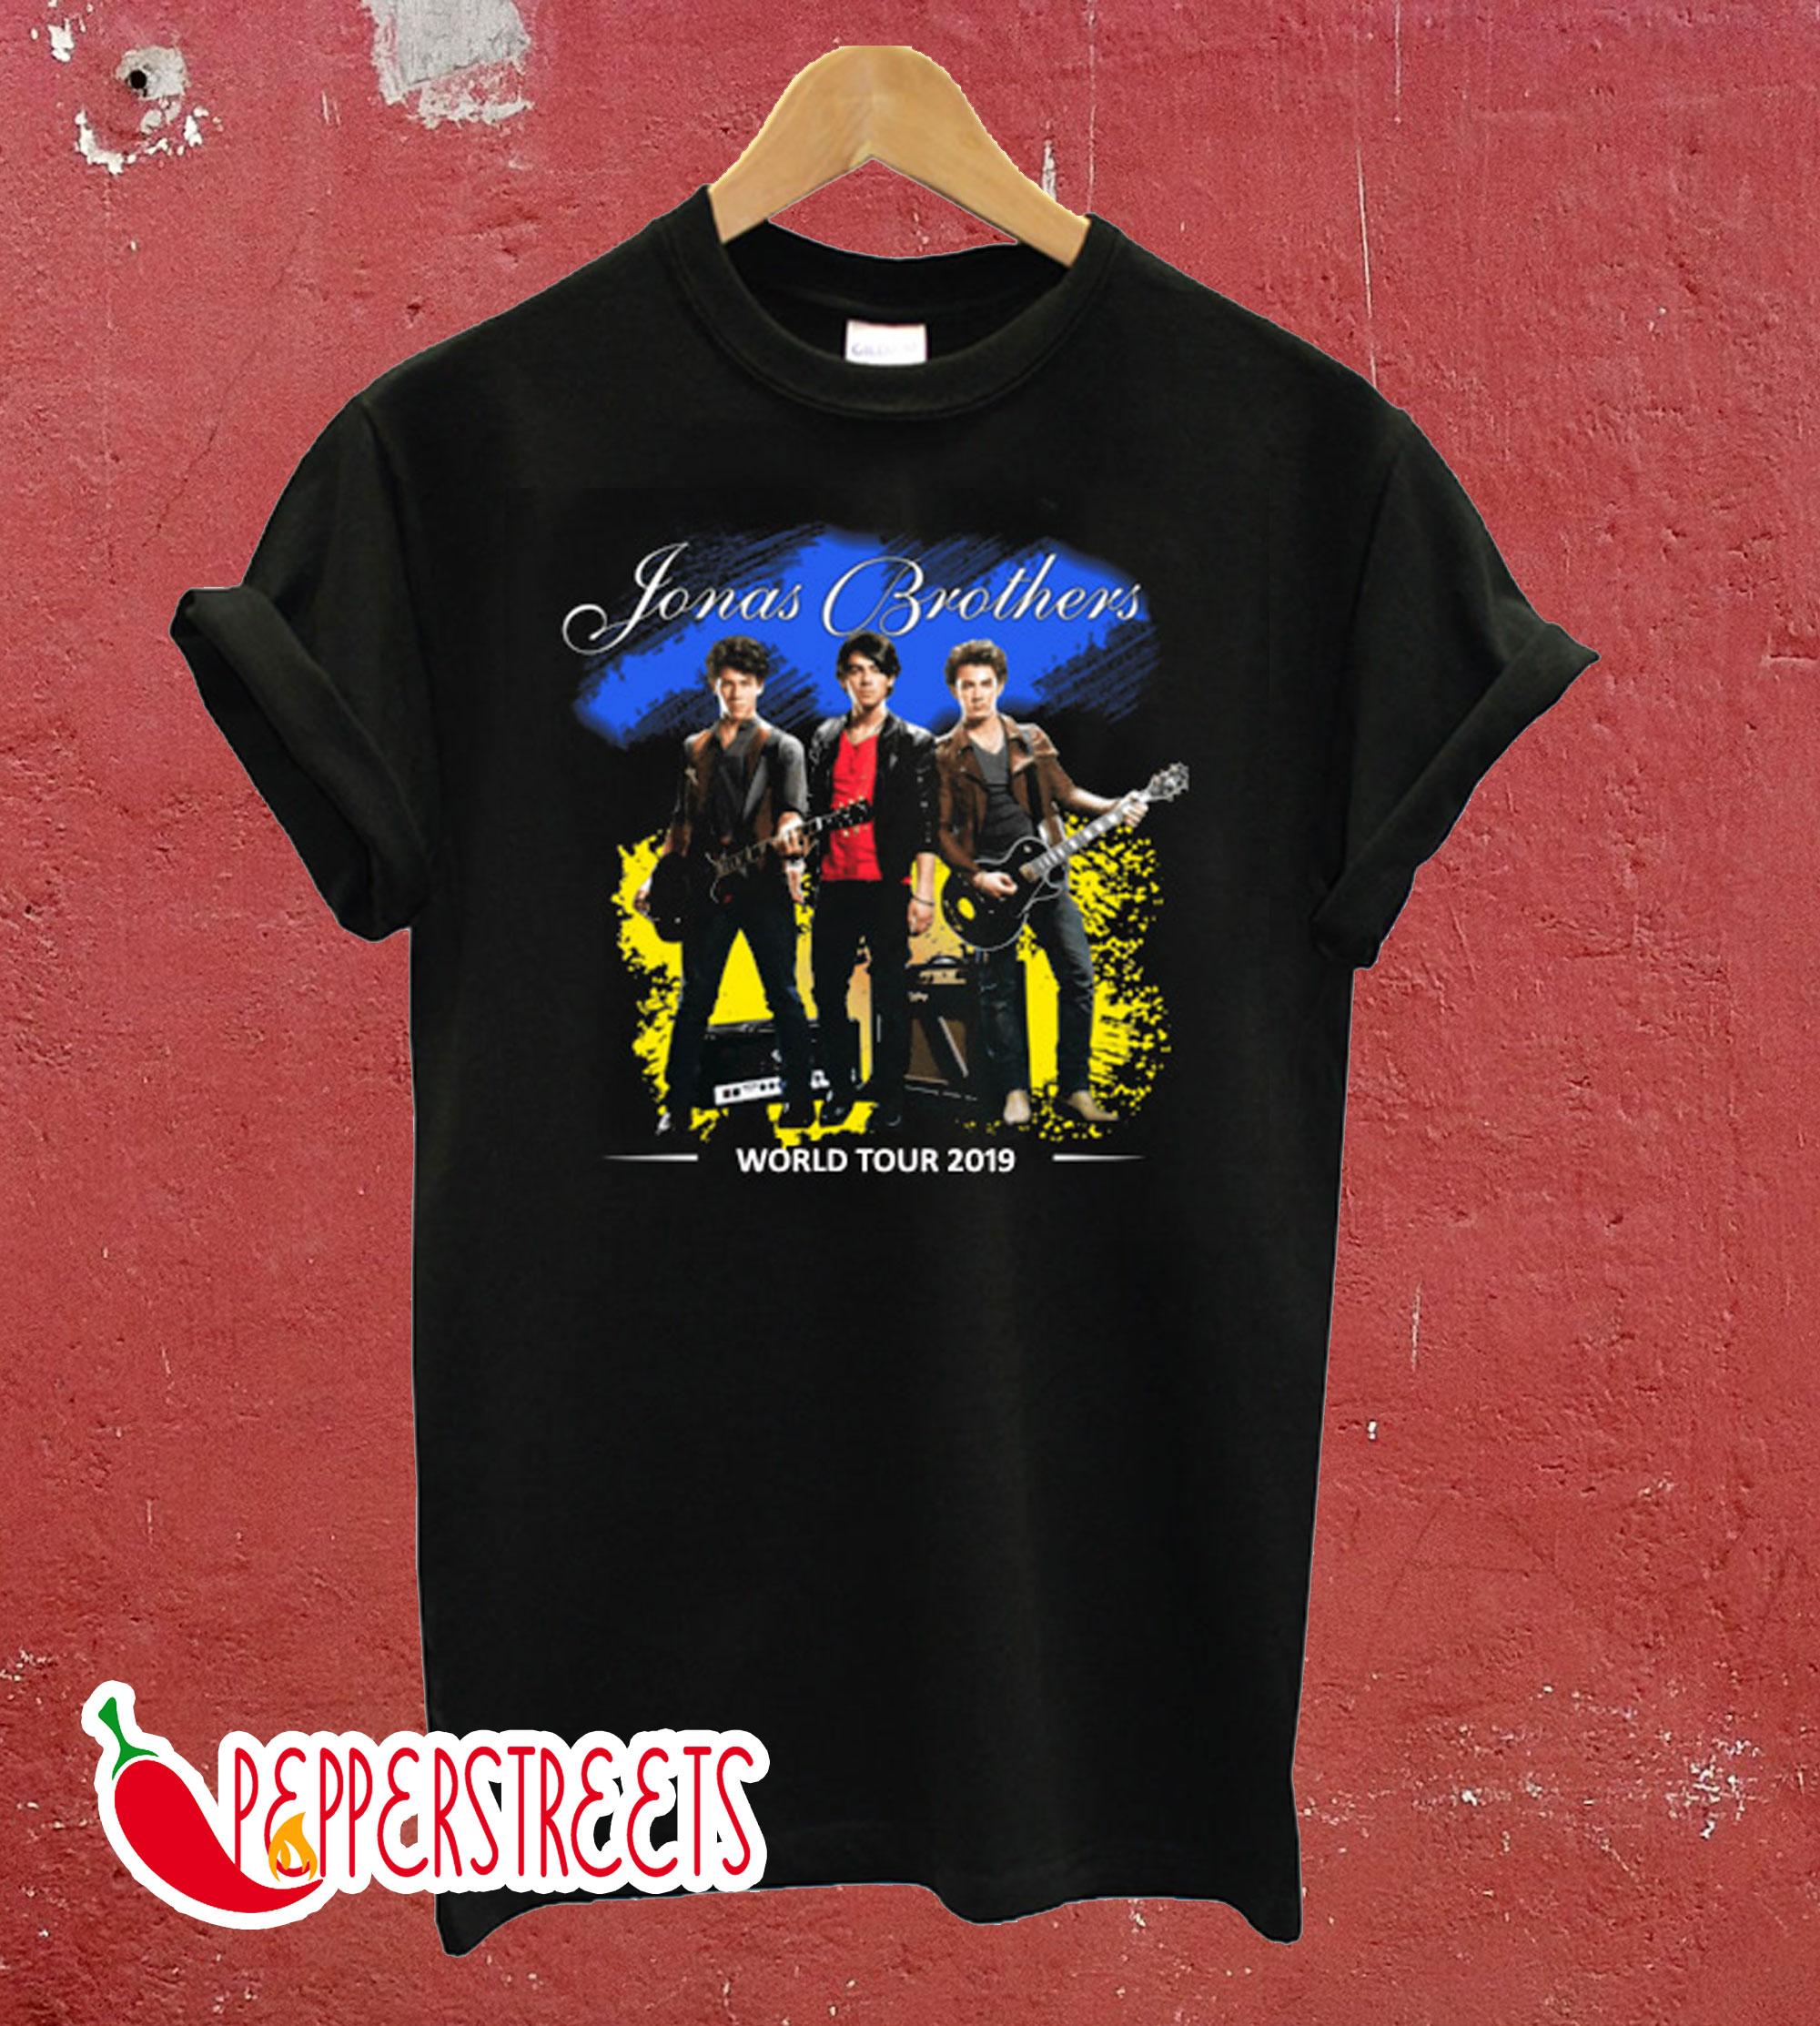 The Jonas Brothers World Tour T-Shirt